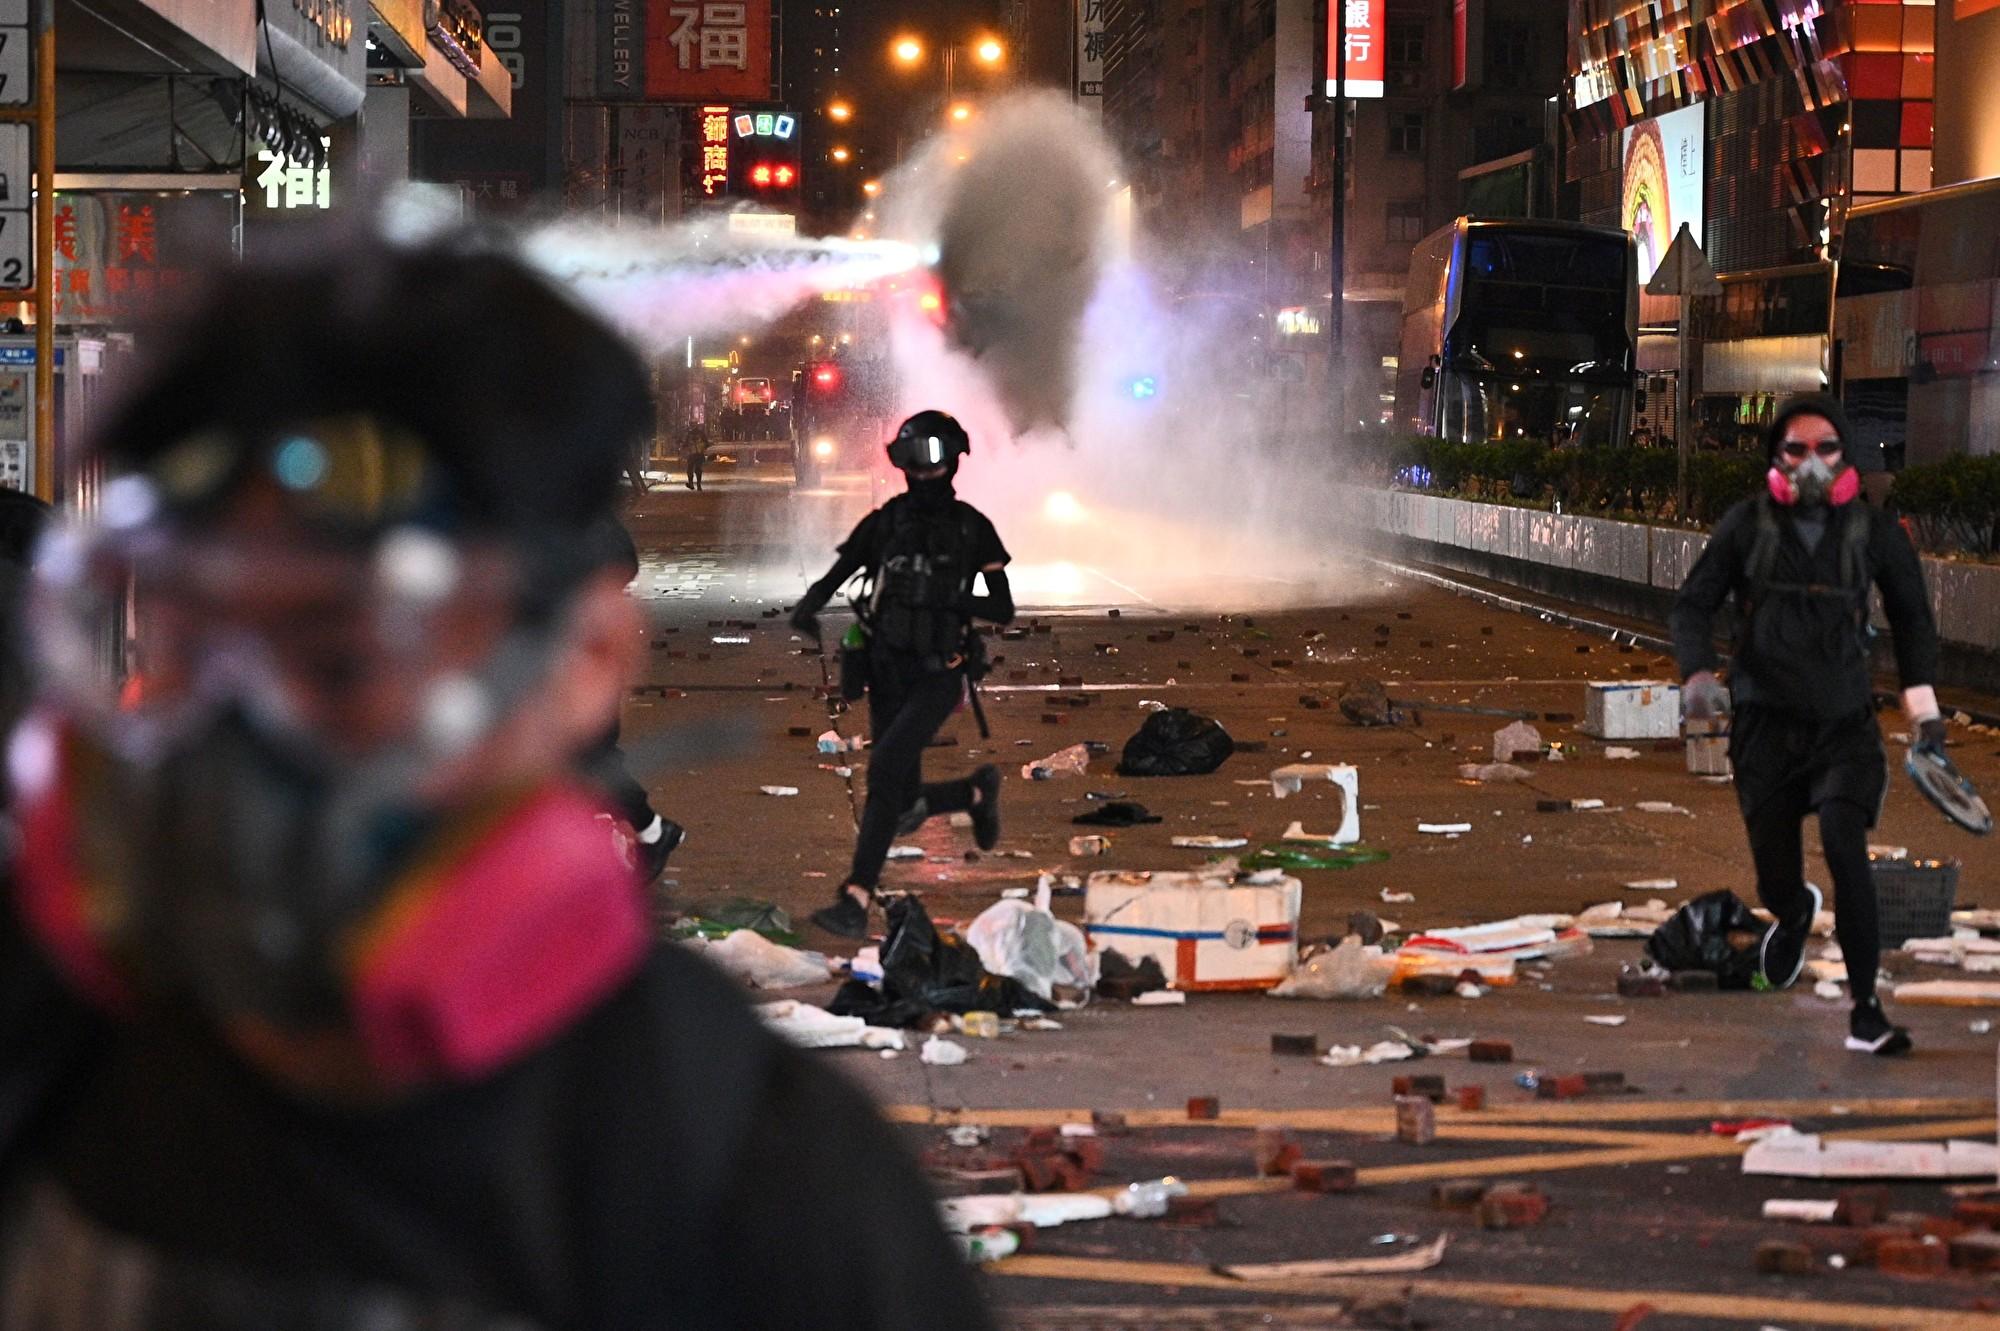 11月11日,防暴警察在旺角出動水炮車,發射白色水劑。(PHILIP FONG/AFP via Getty Images)